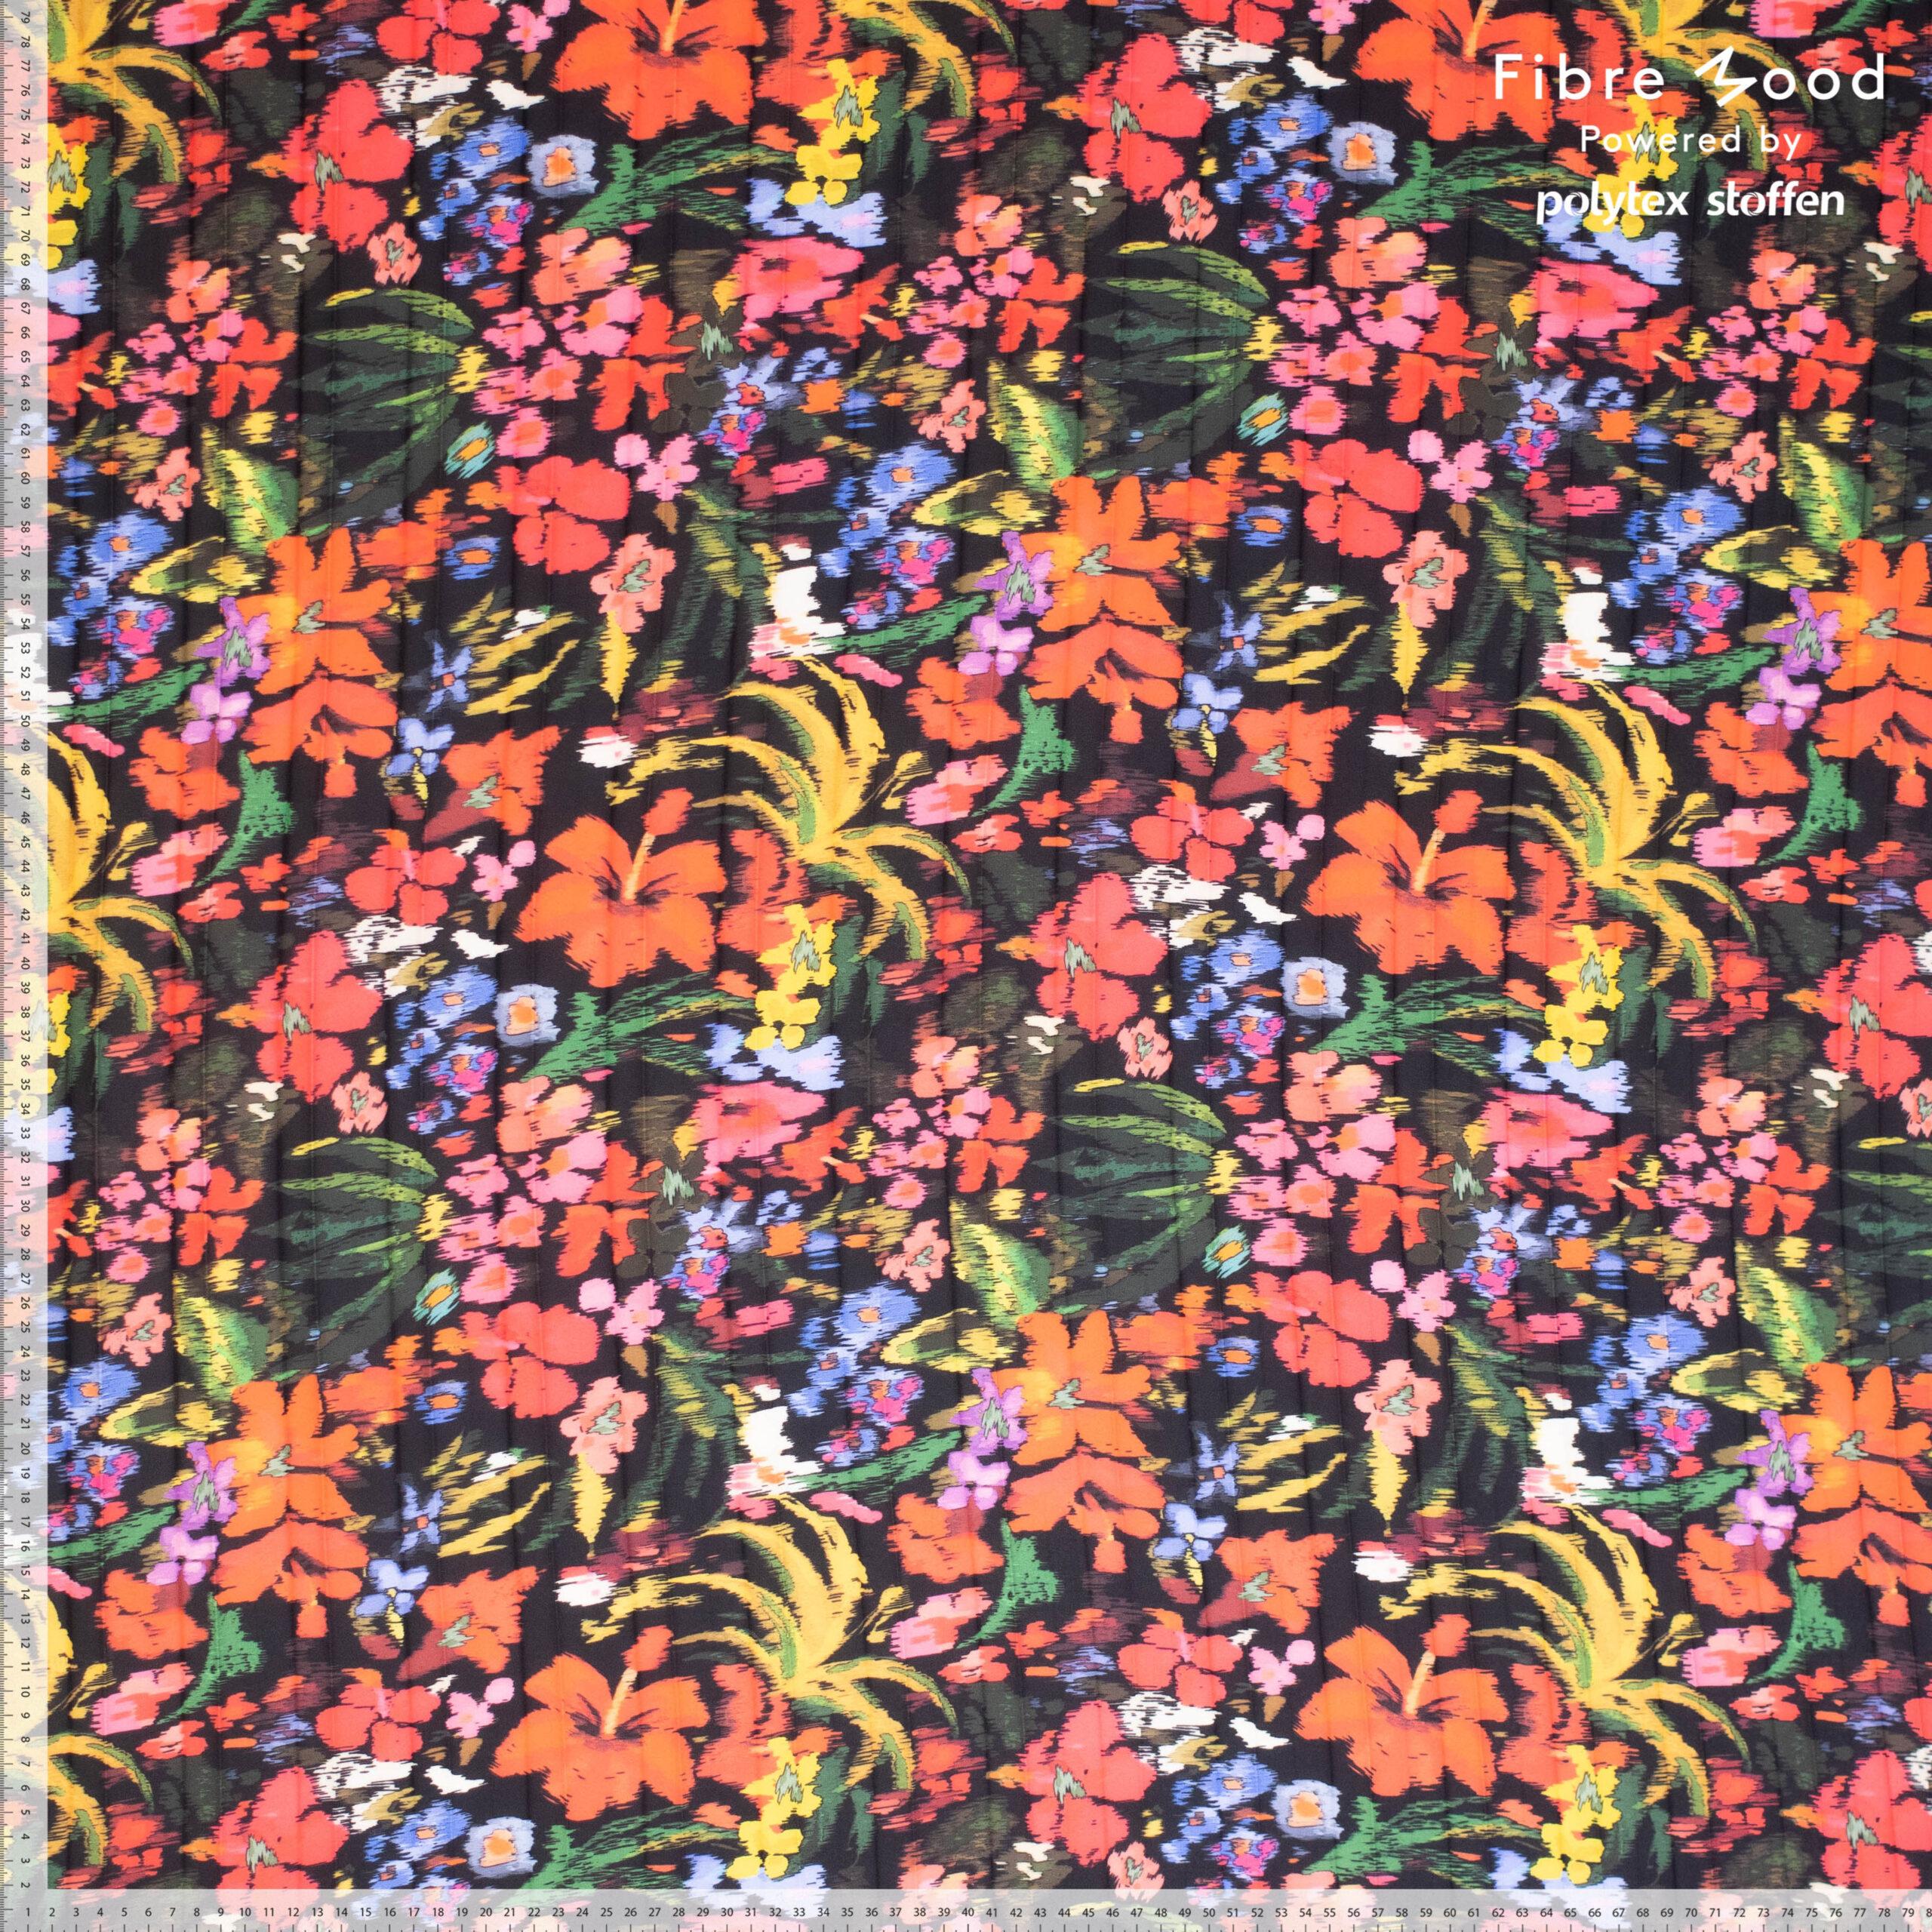 fibre mood polu=yester plisse bloemenprint bloom fiona